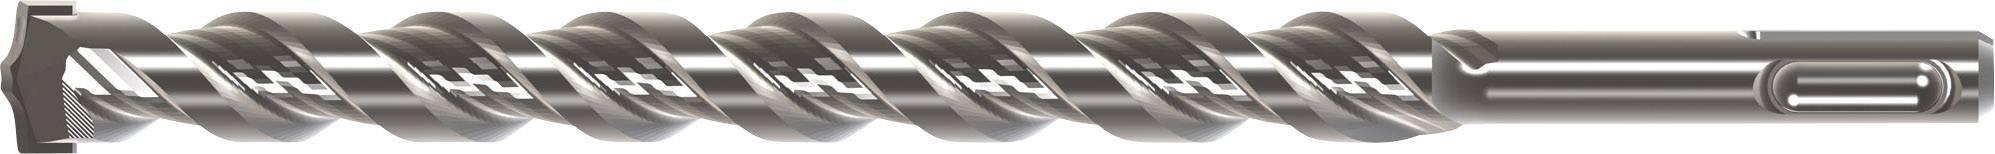 Tvrdý kov kladivový vrták Heller 156530, 25 mm, 450 mm, 1 ks